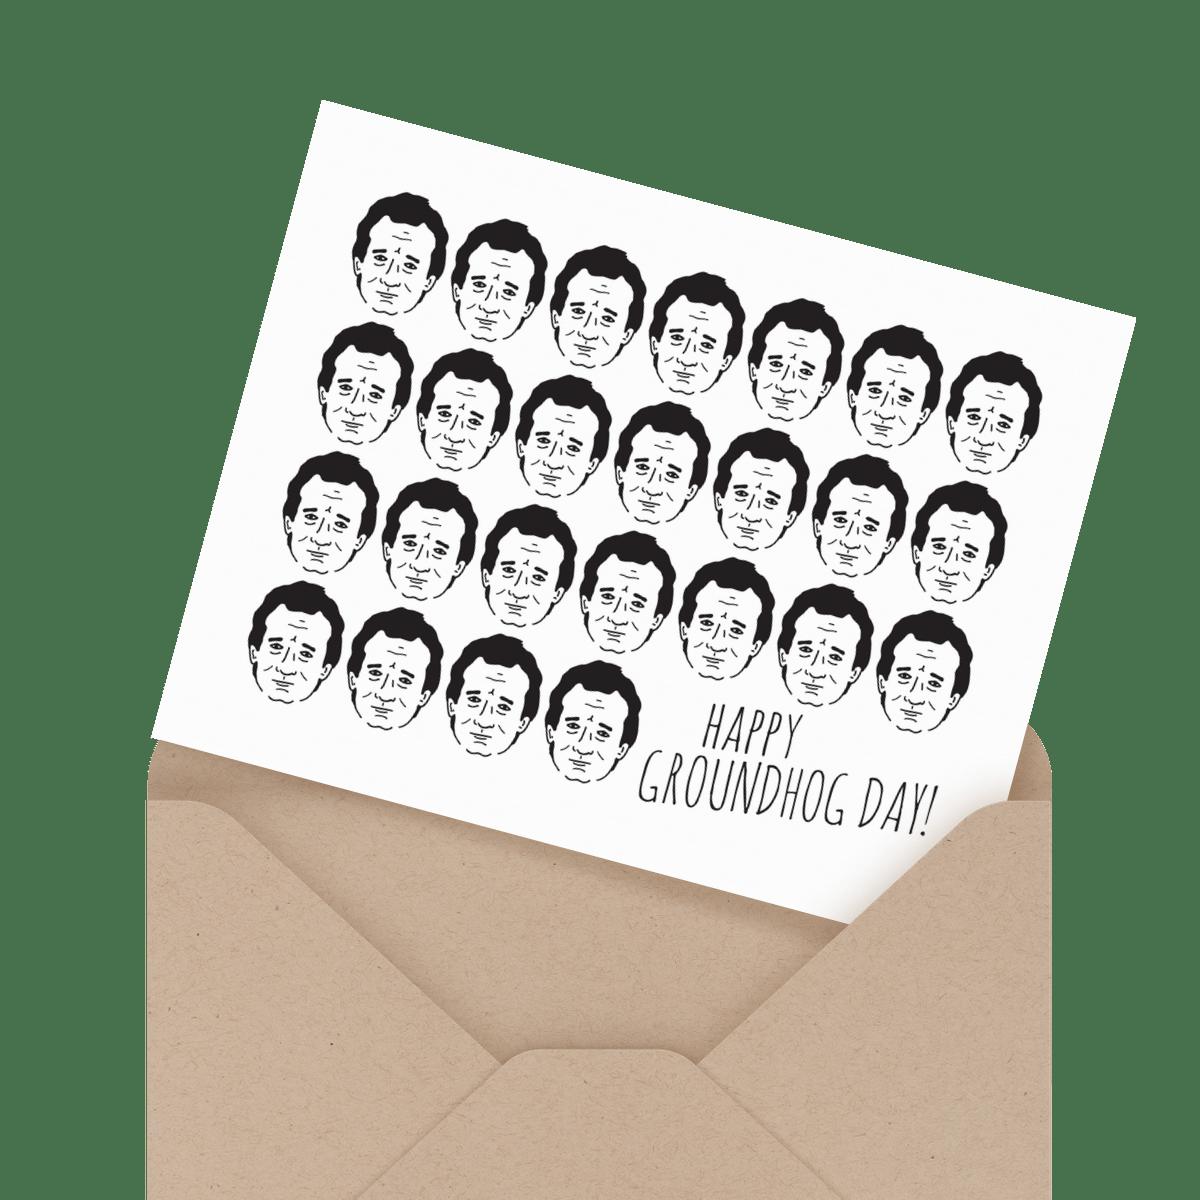 funny bill murray groundhog day card